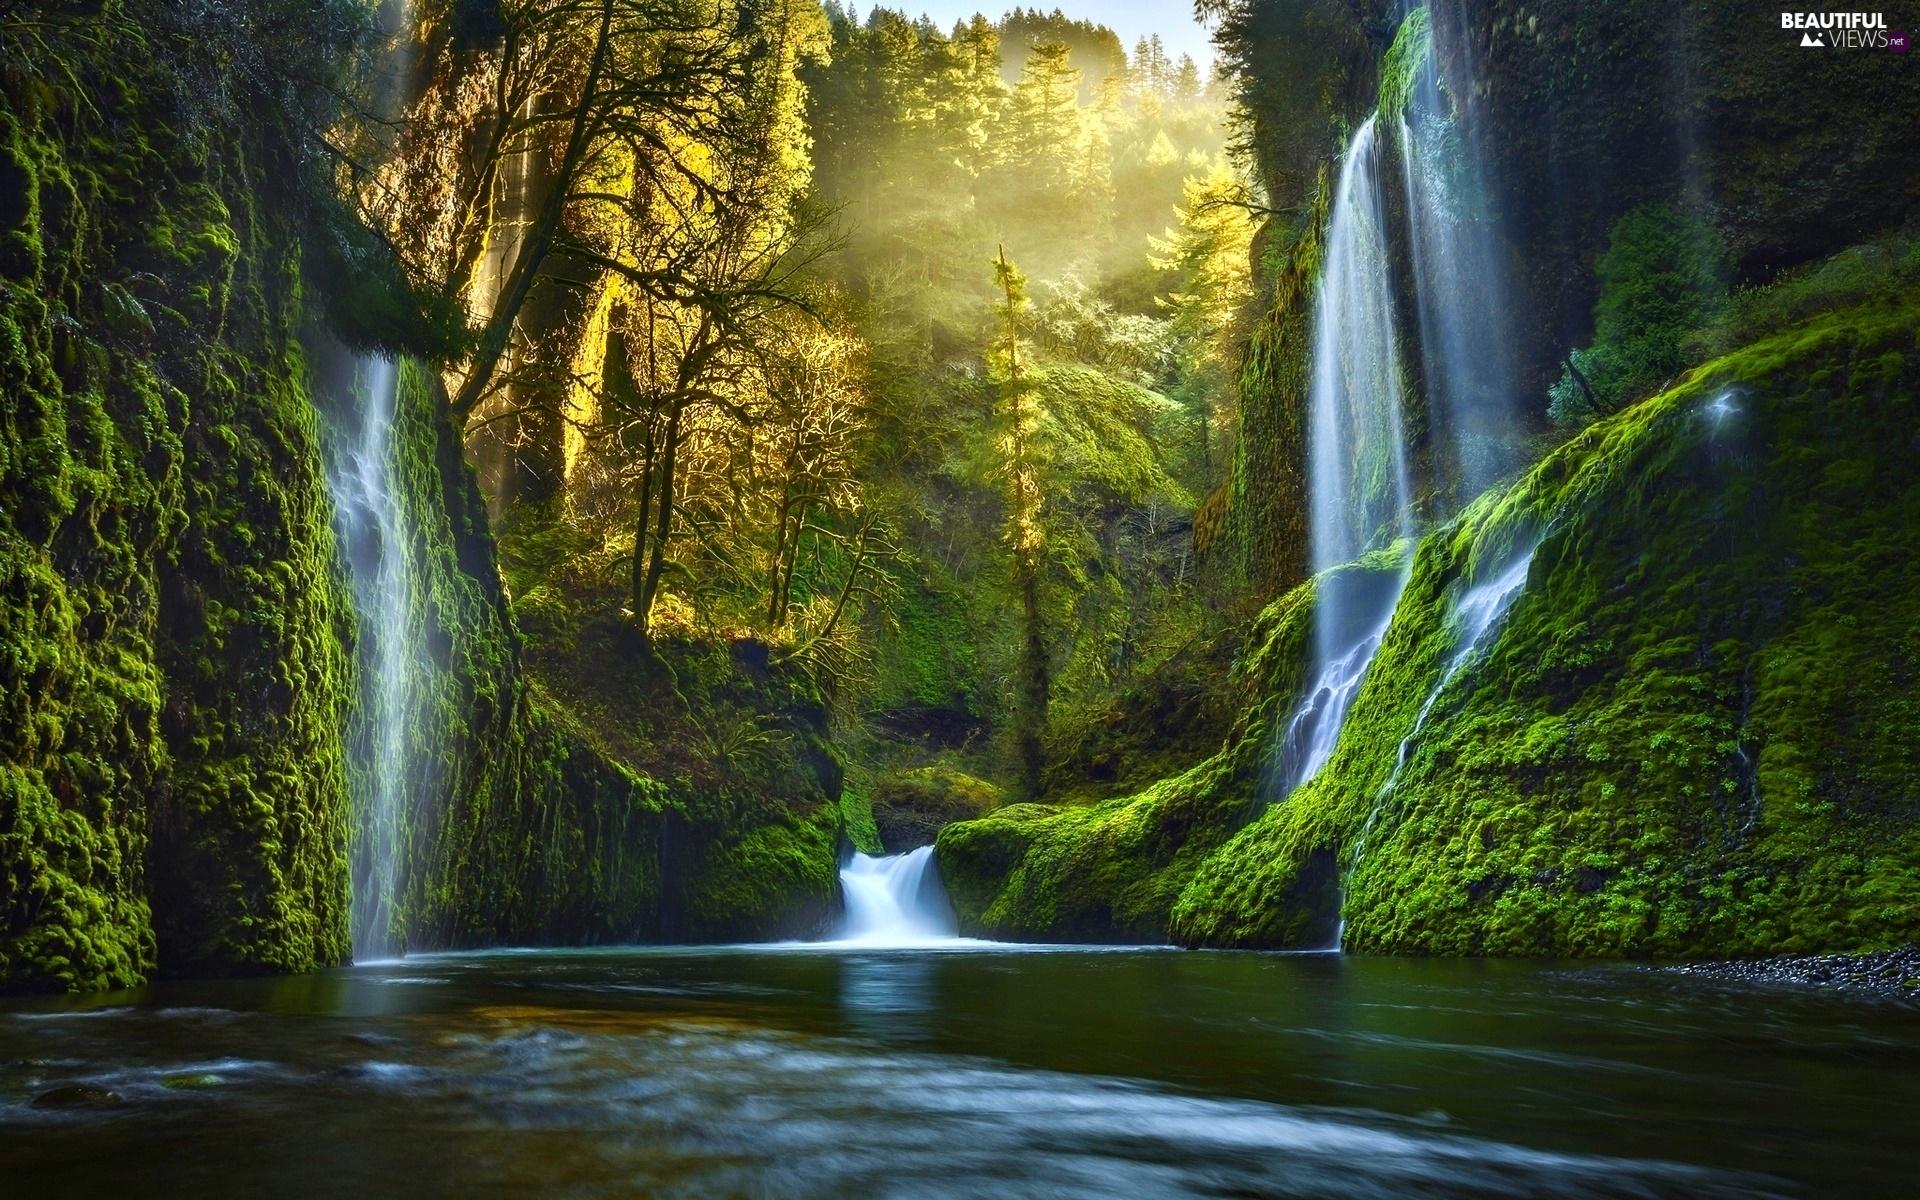 http://www.beautiful-views.net/views/breaking-light-waterfall-river-sky-through.jpg